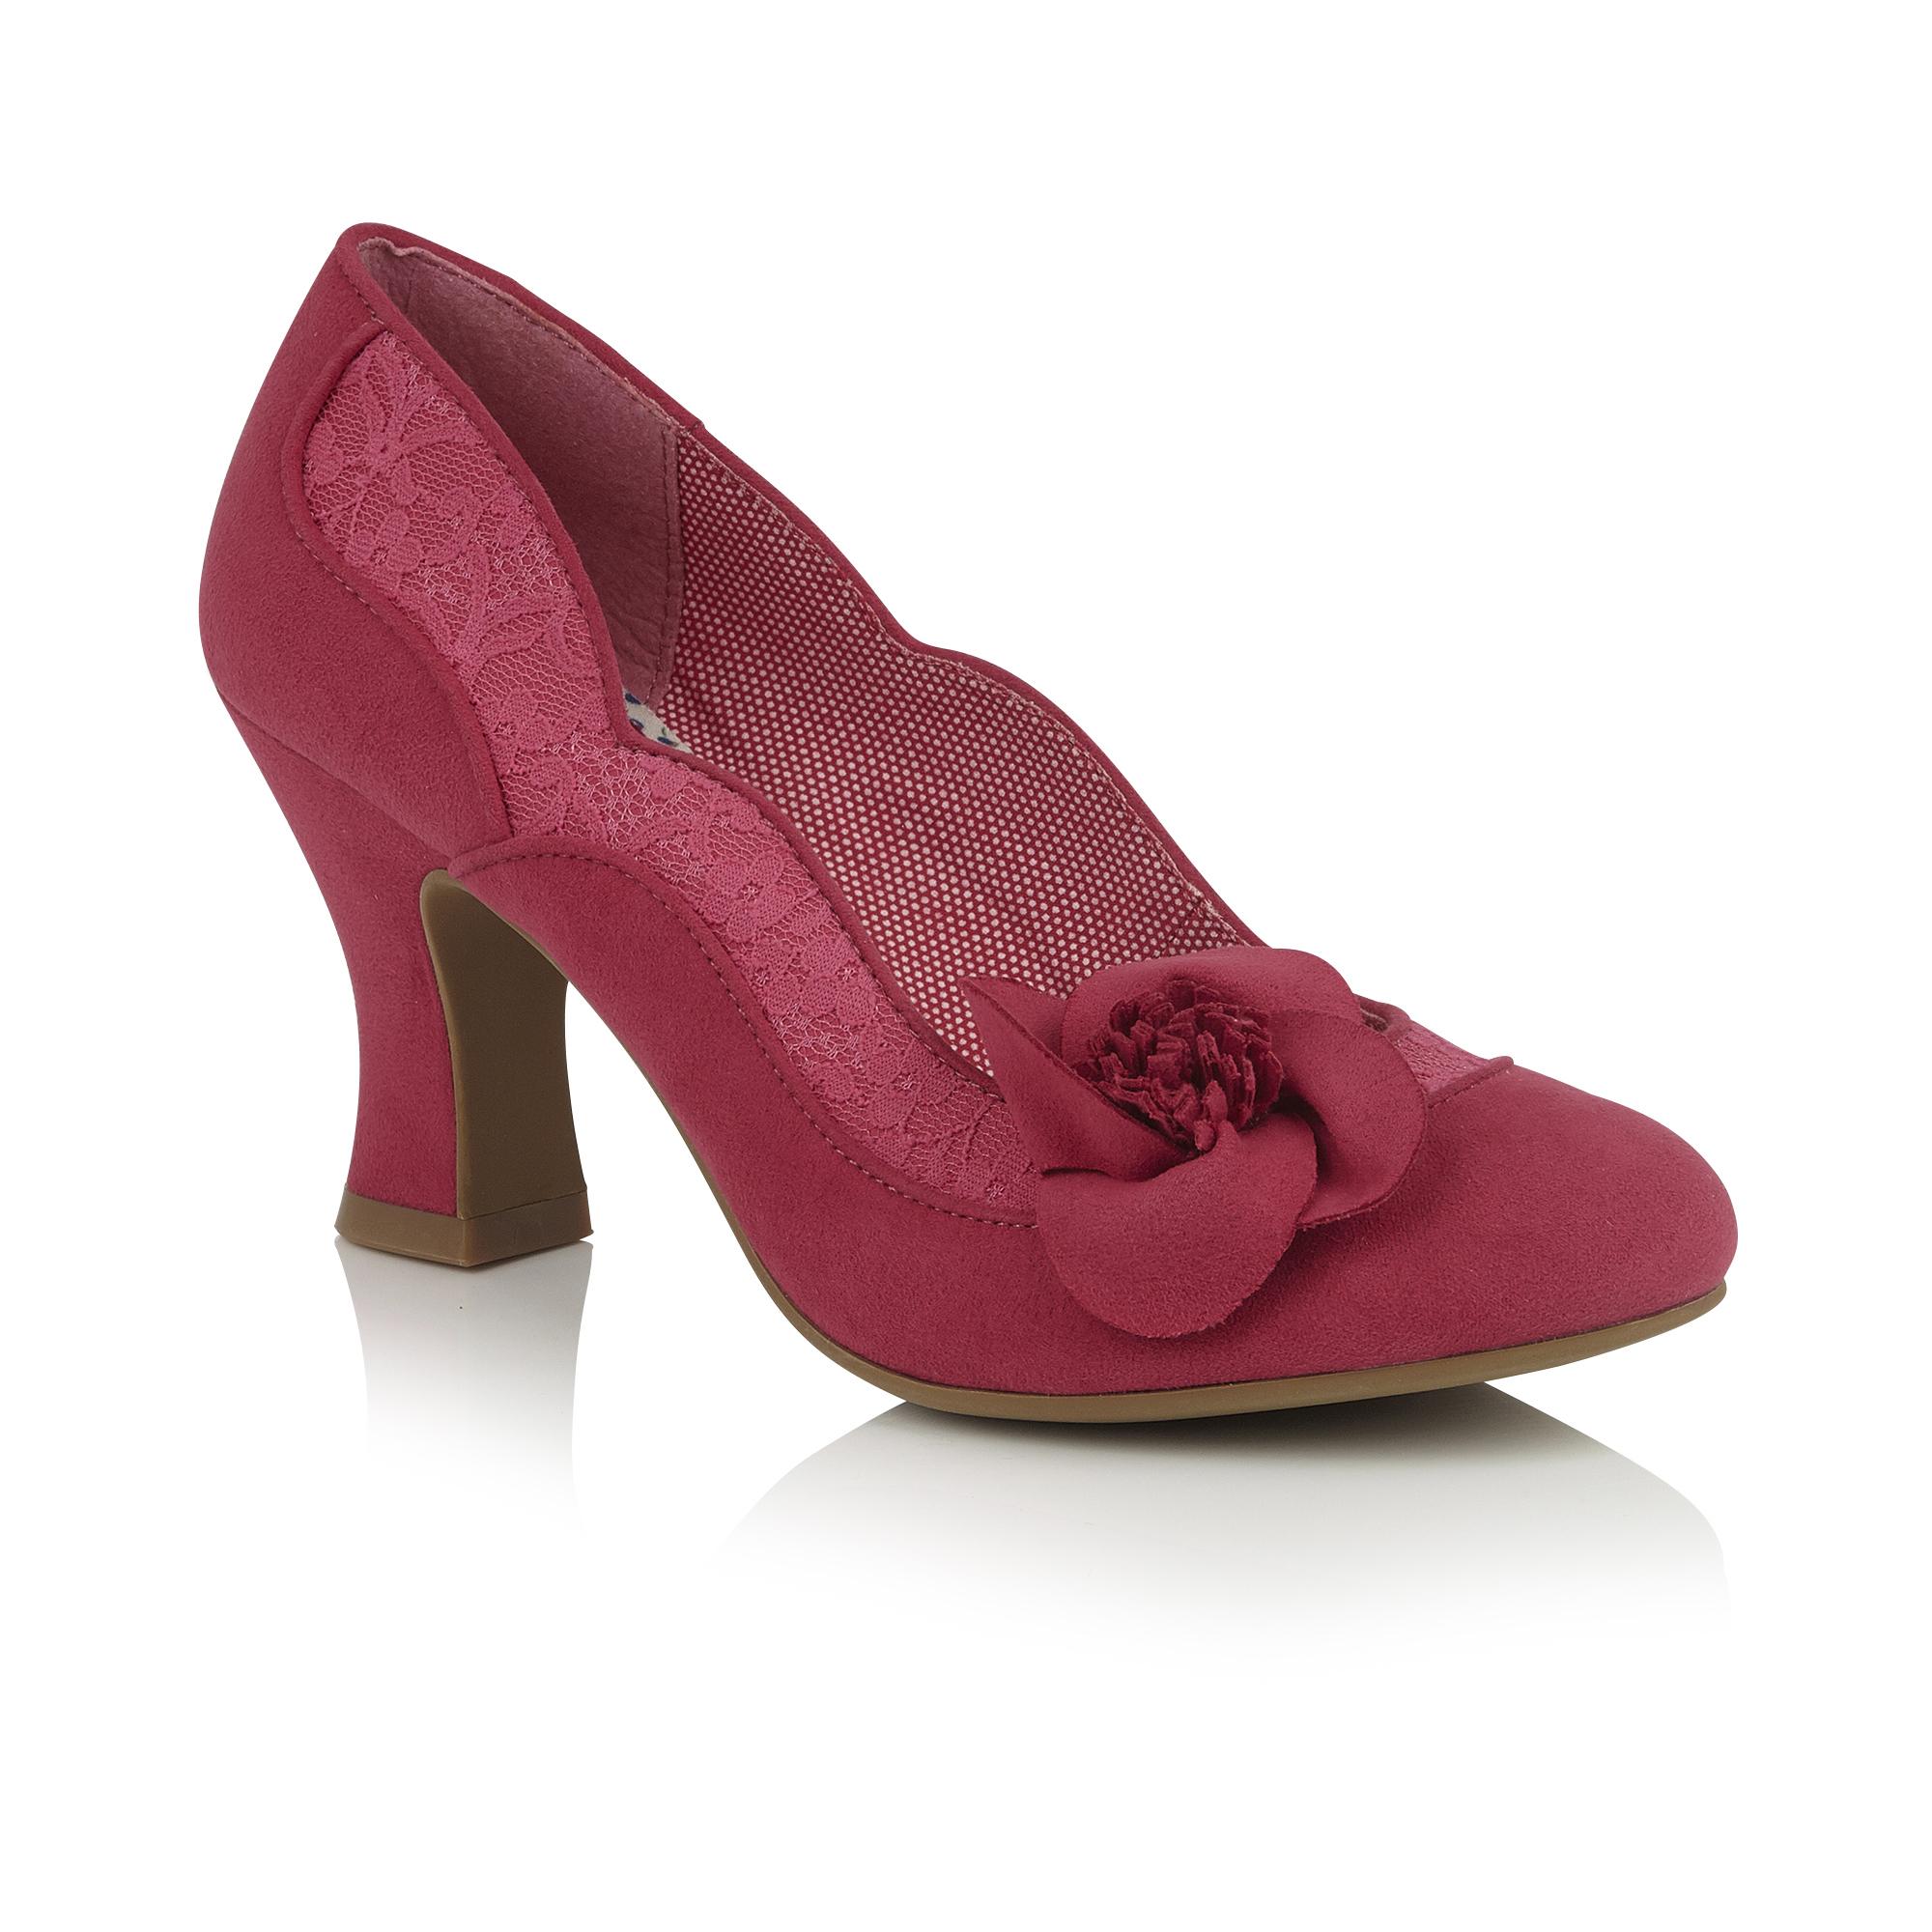 5ba871a31203 Ruby Shoo Veronica Fuchsia Pink Lace Corsage High Heel Court Shoe 3 ...